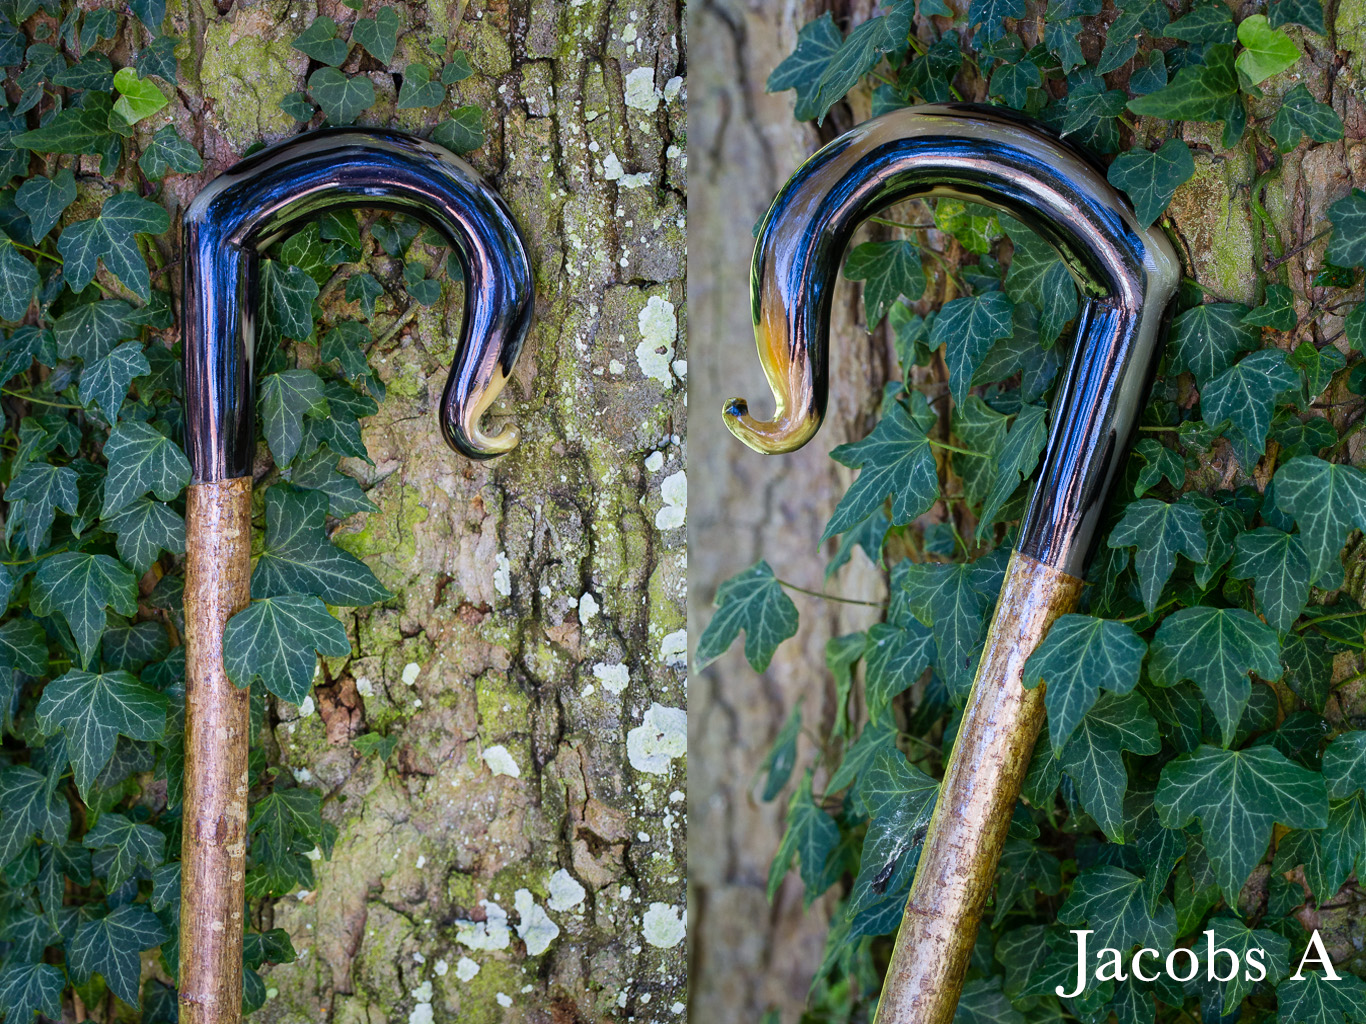 Jacobs Crook A